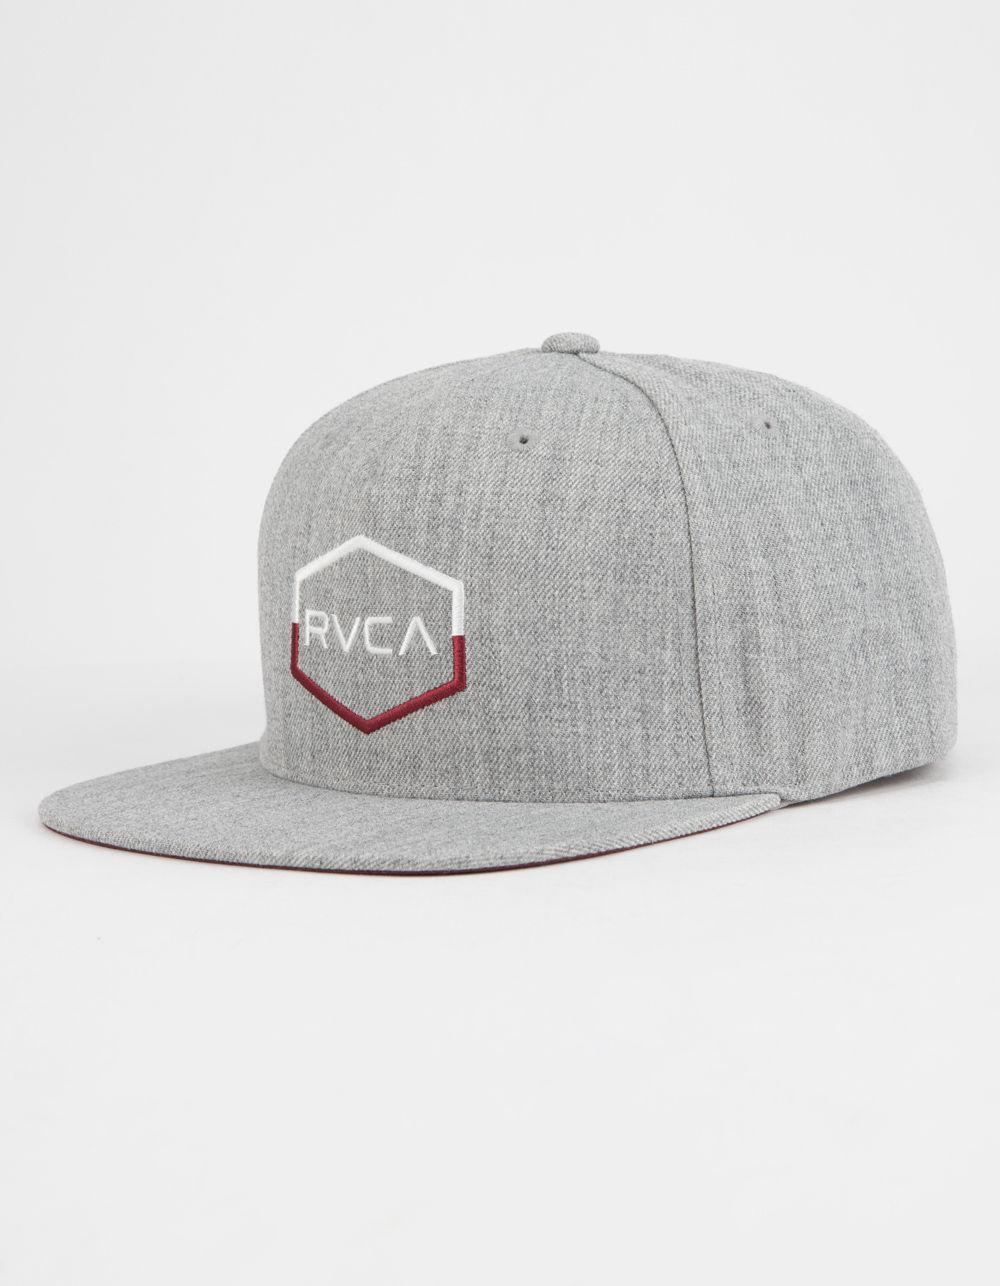 3ec2a3da Lyst - RVCA Commonwealth Iii Mens Snapback Hat in Gray for Men